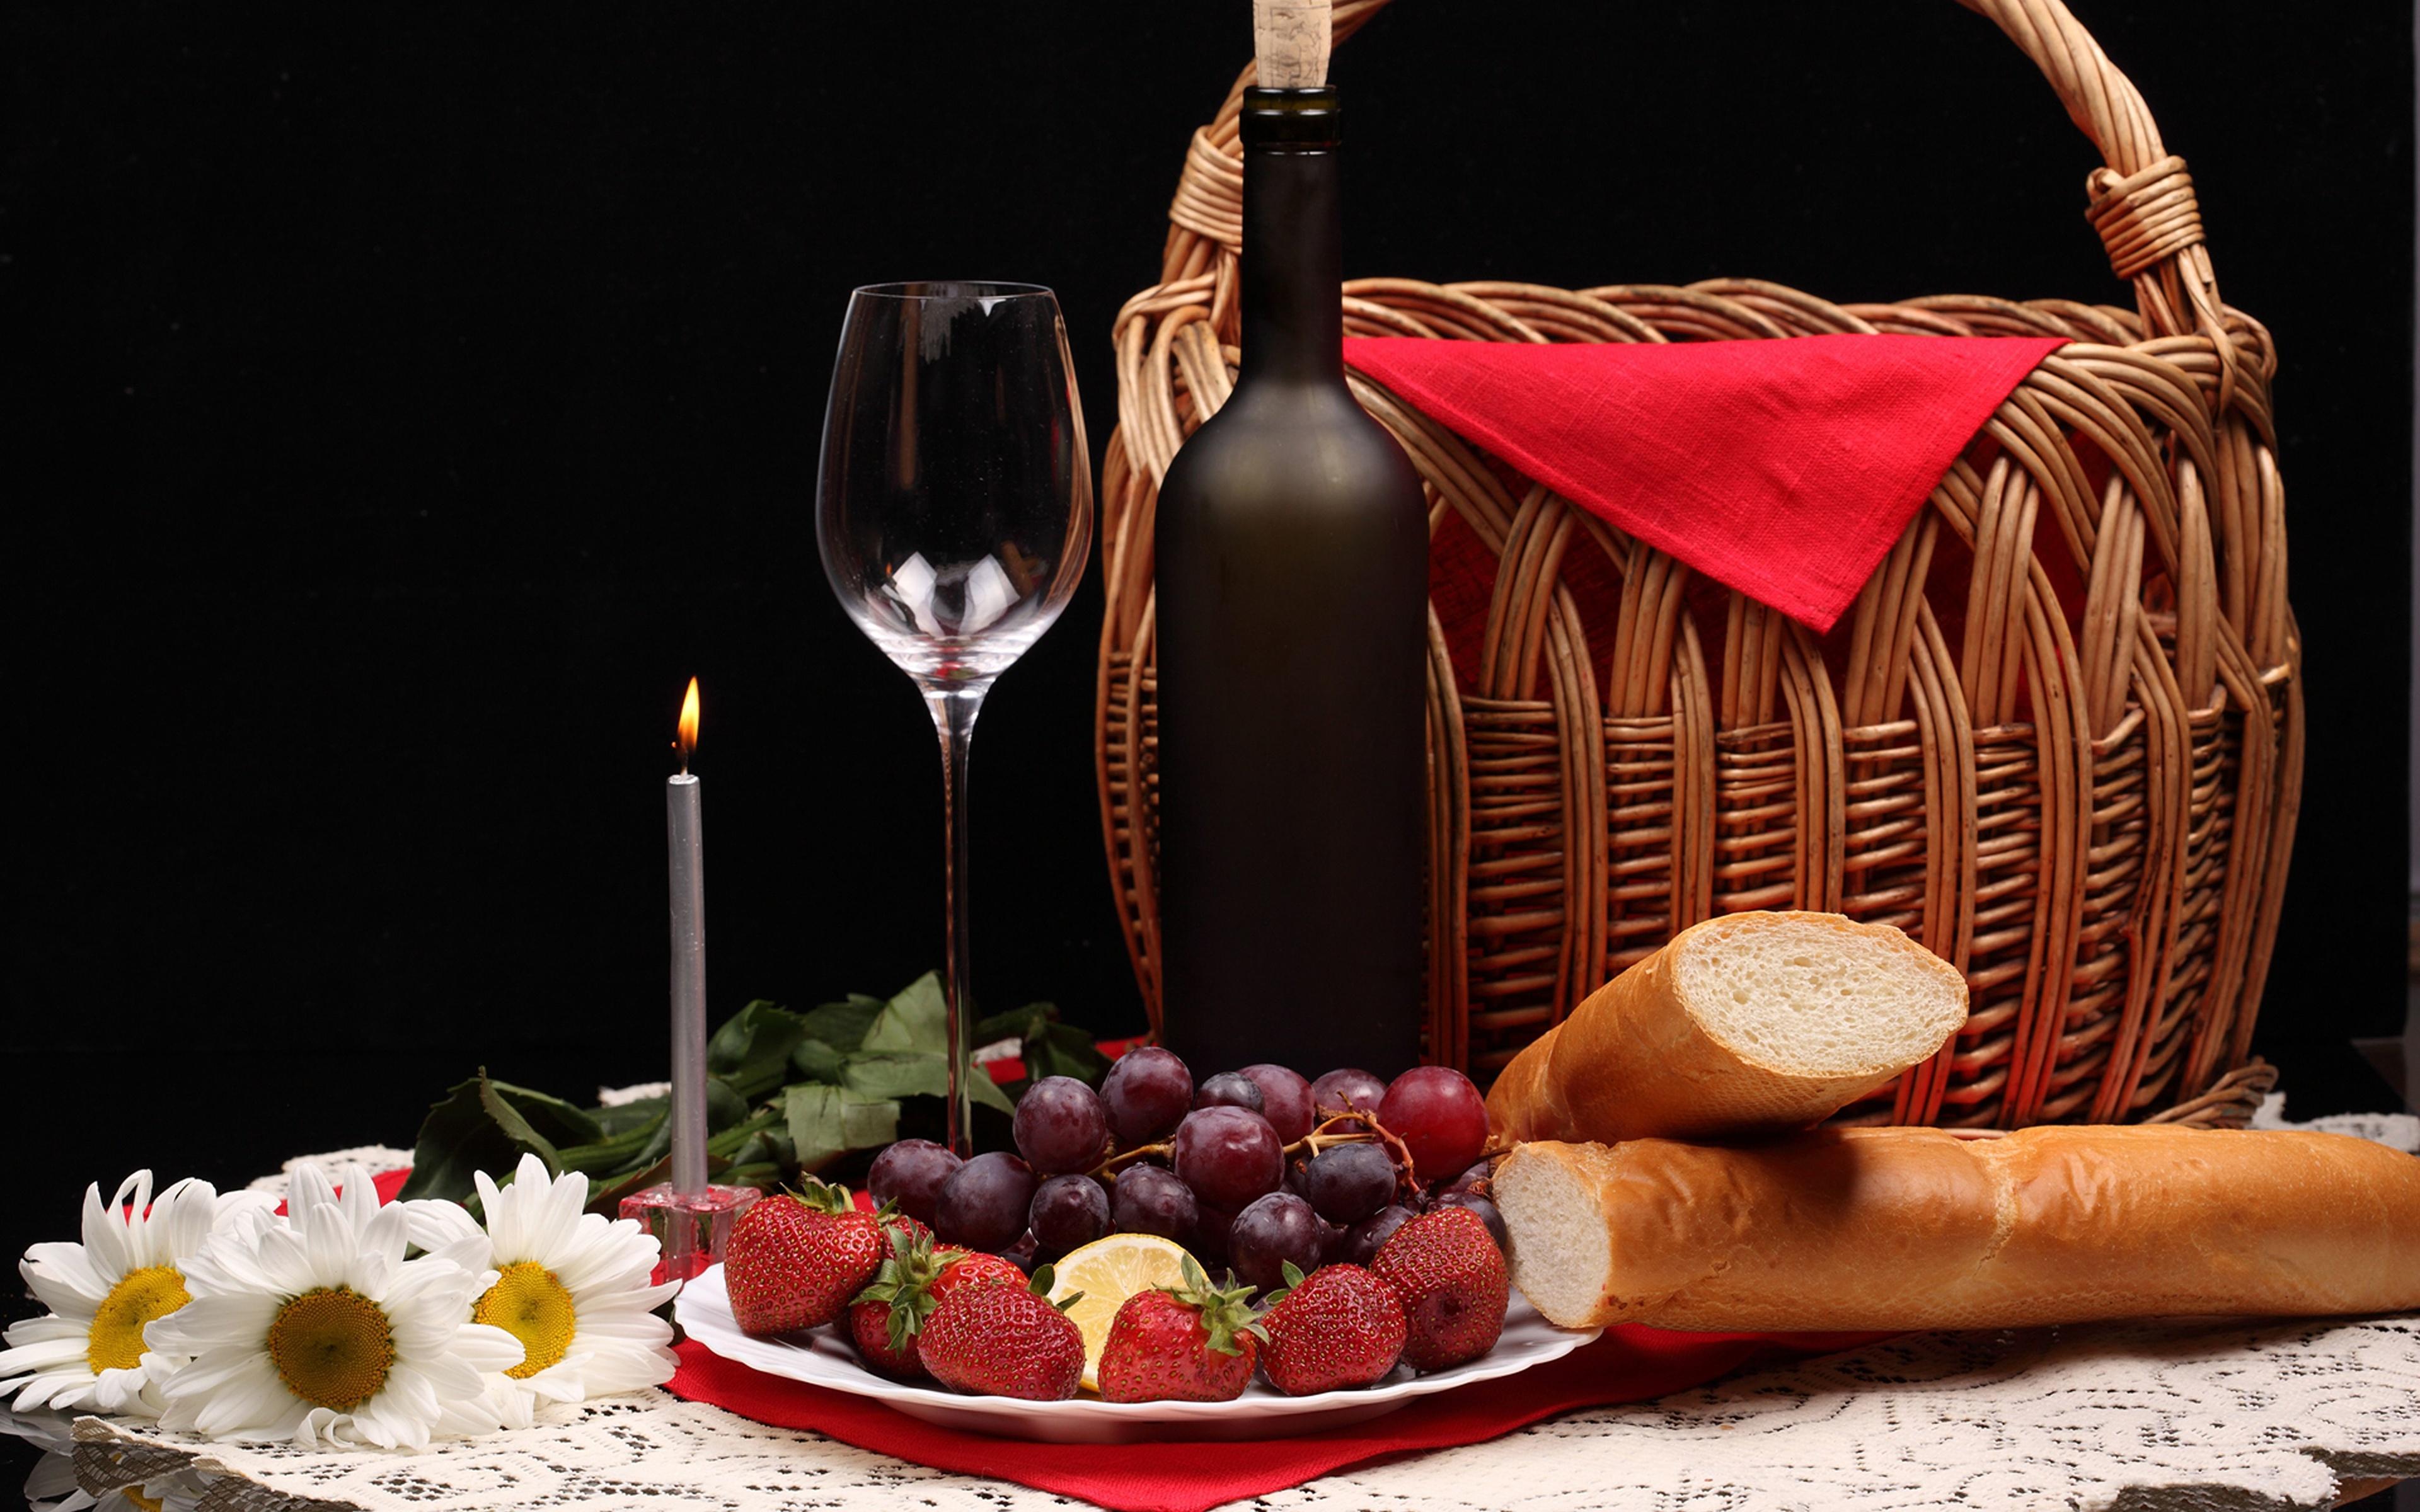 бокал вино корзина сирень  № 3966514 бесплатно